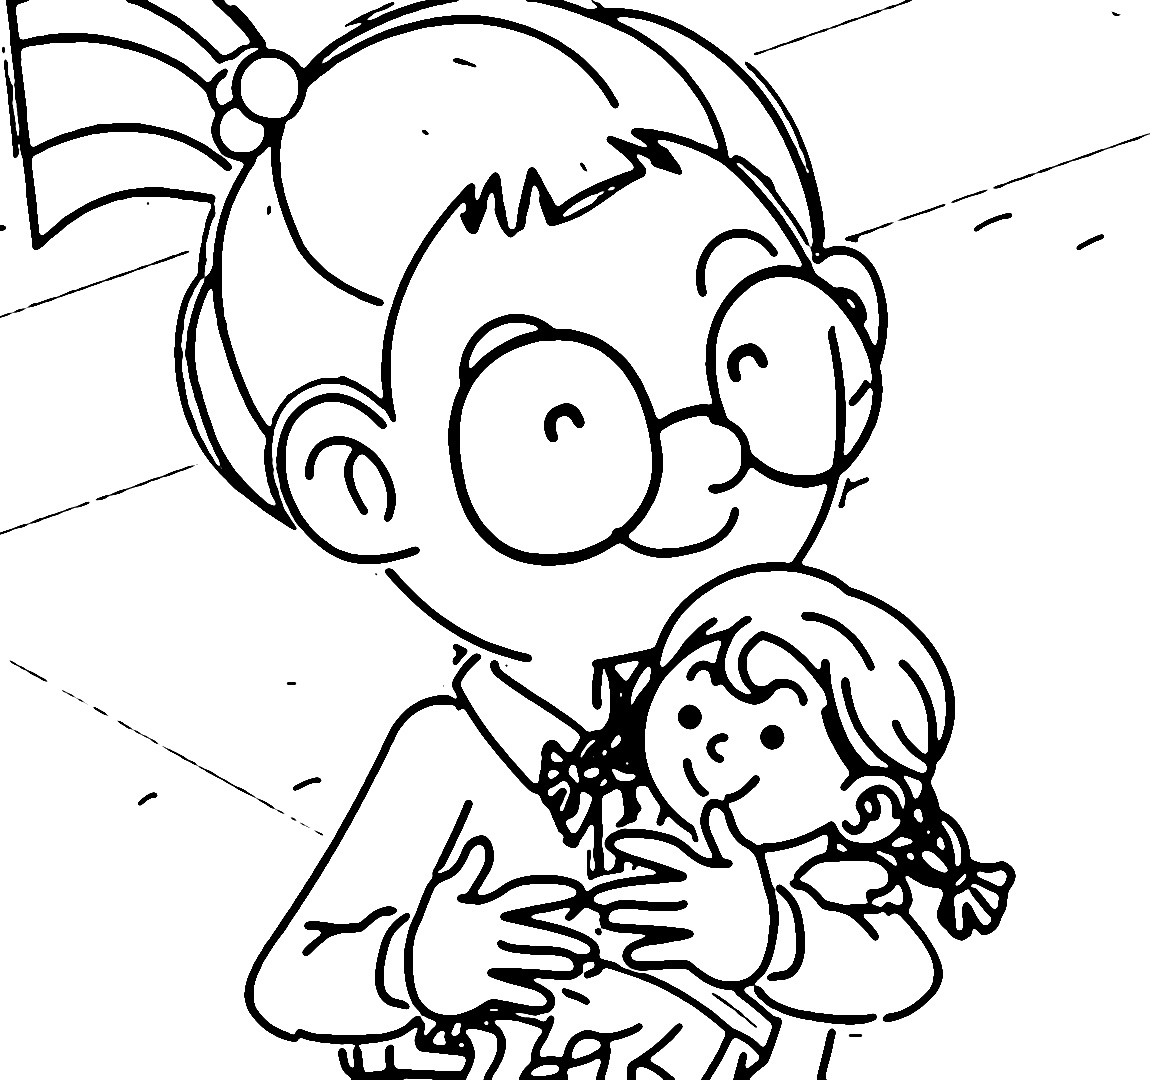 Speaking Cartoon Kids Coloring Page 65